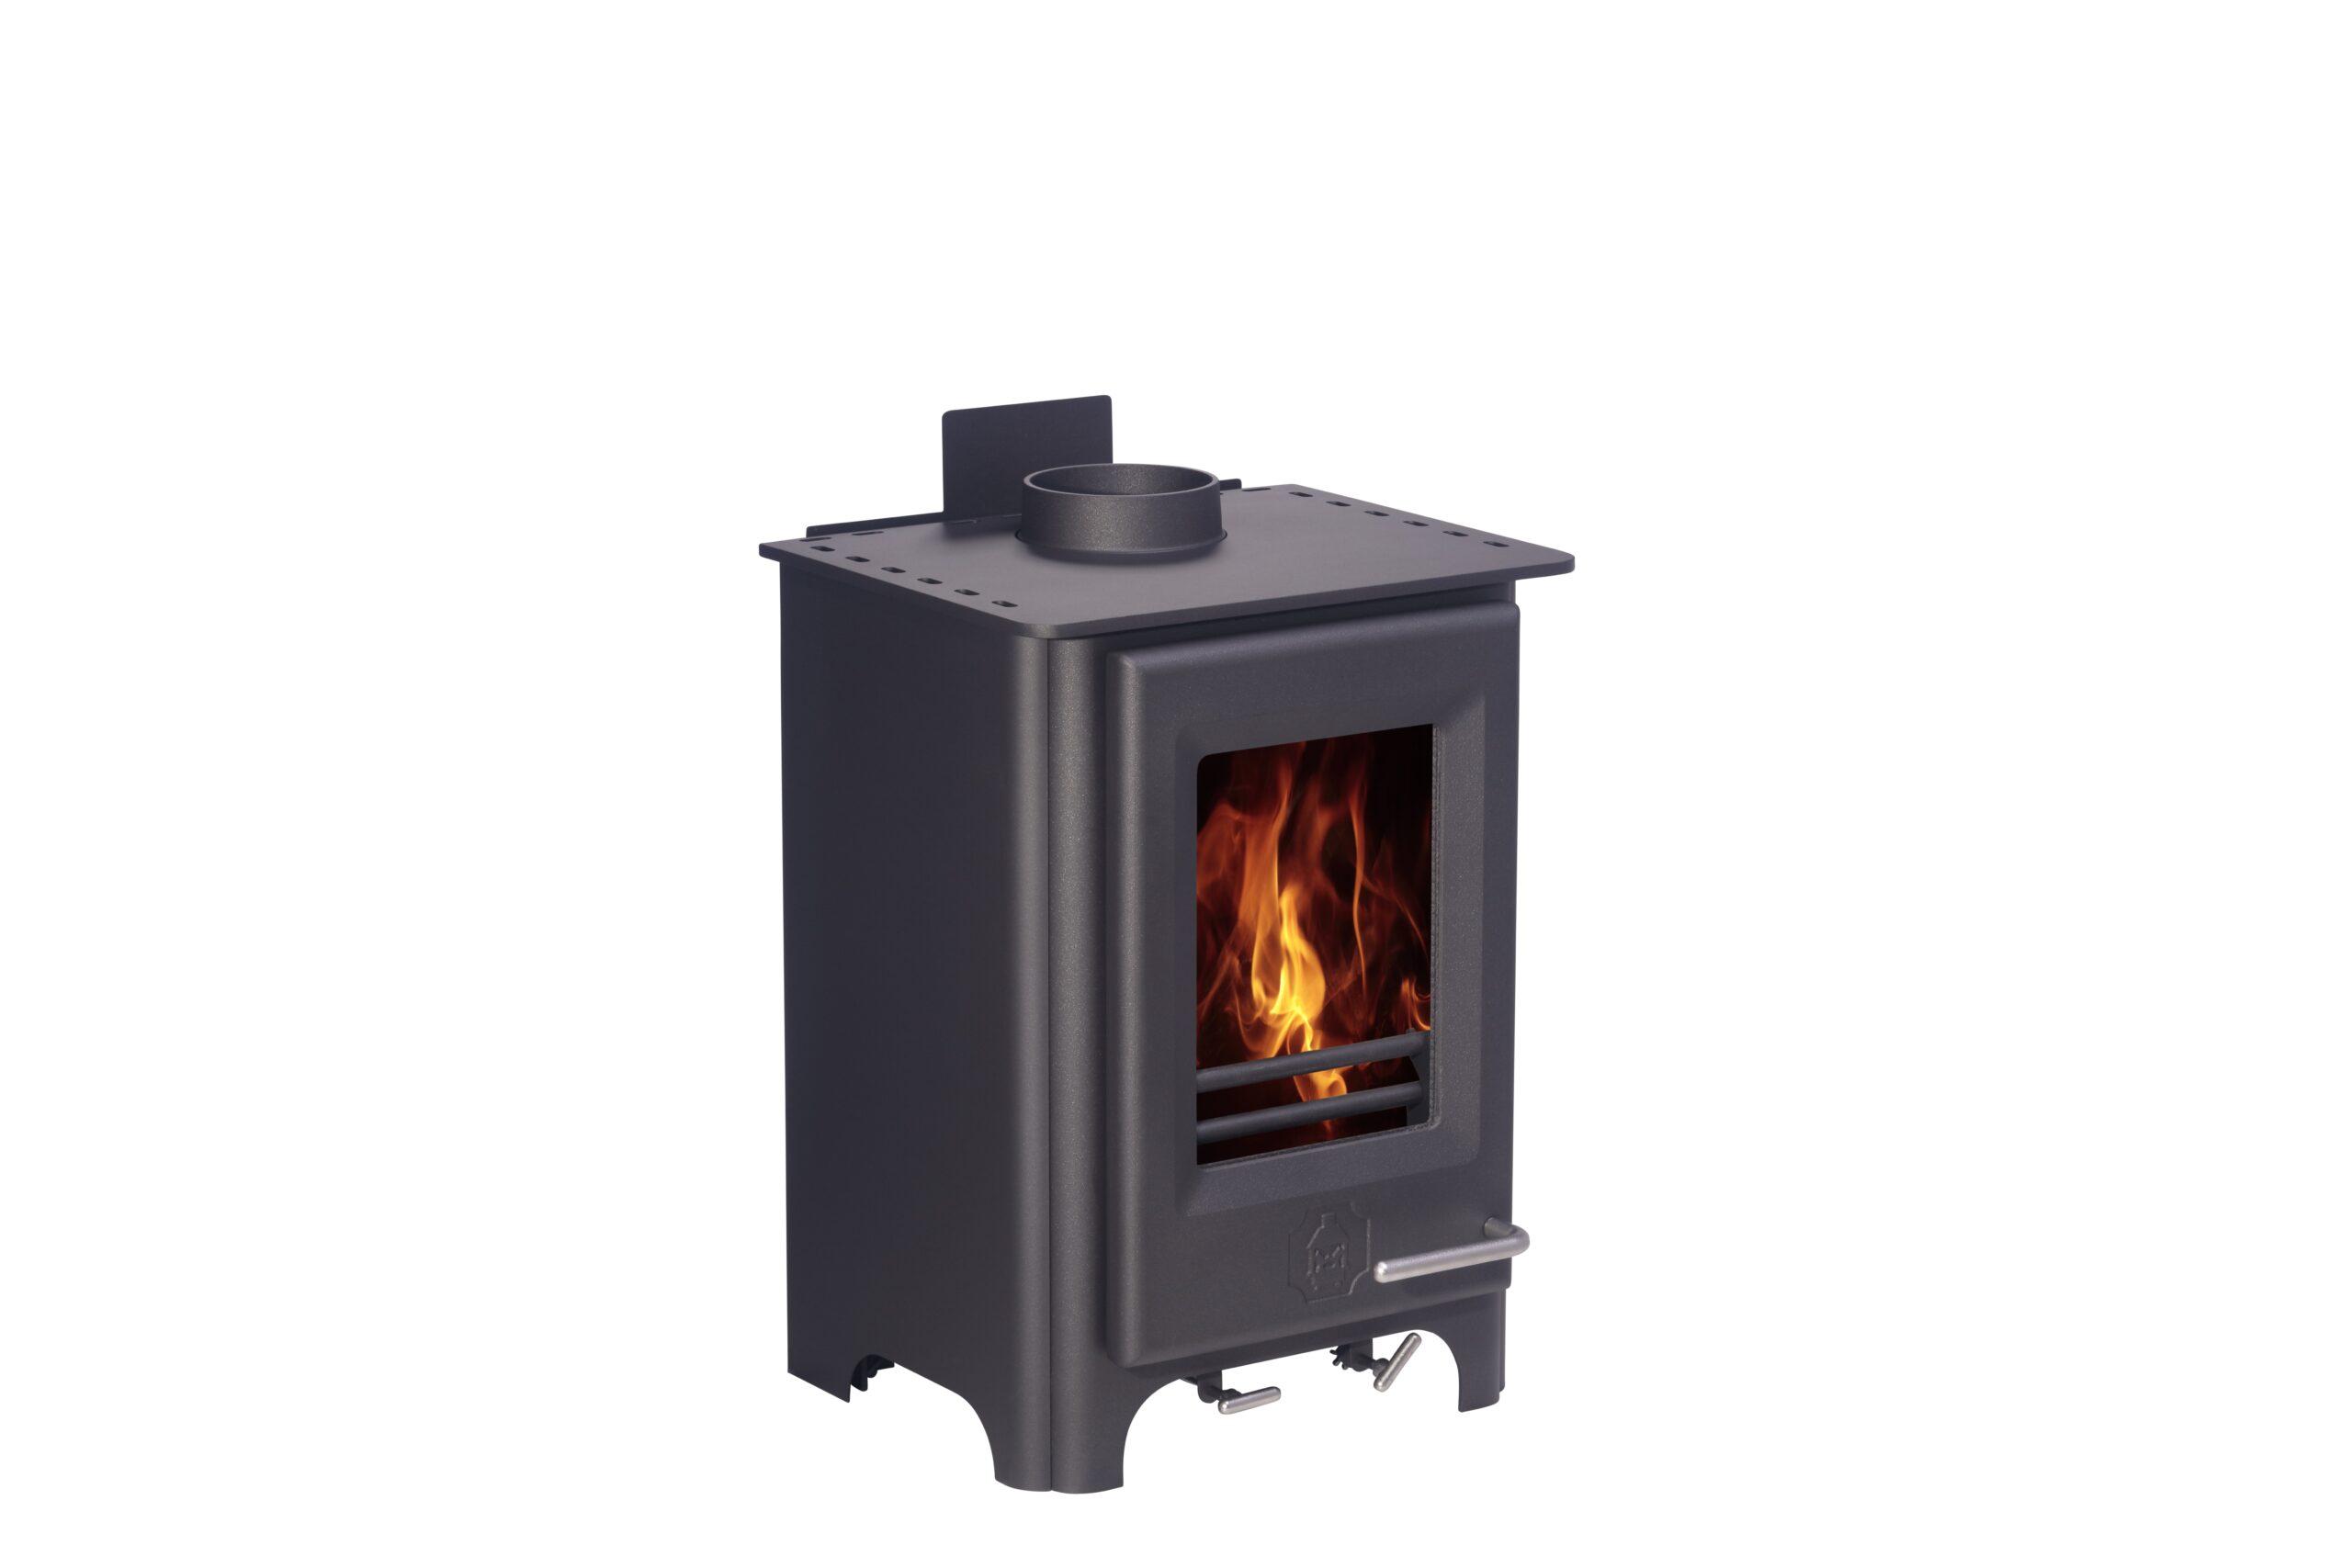 Phoenix Firewren Eco Convector Mineral Fuel